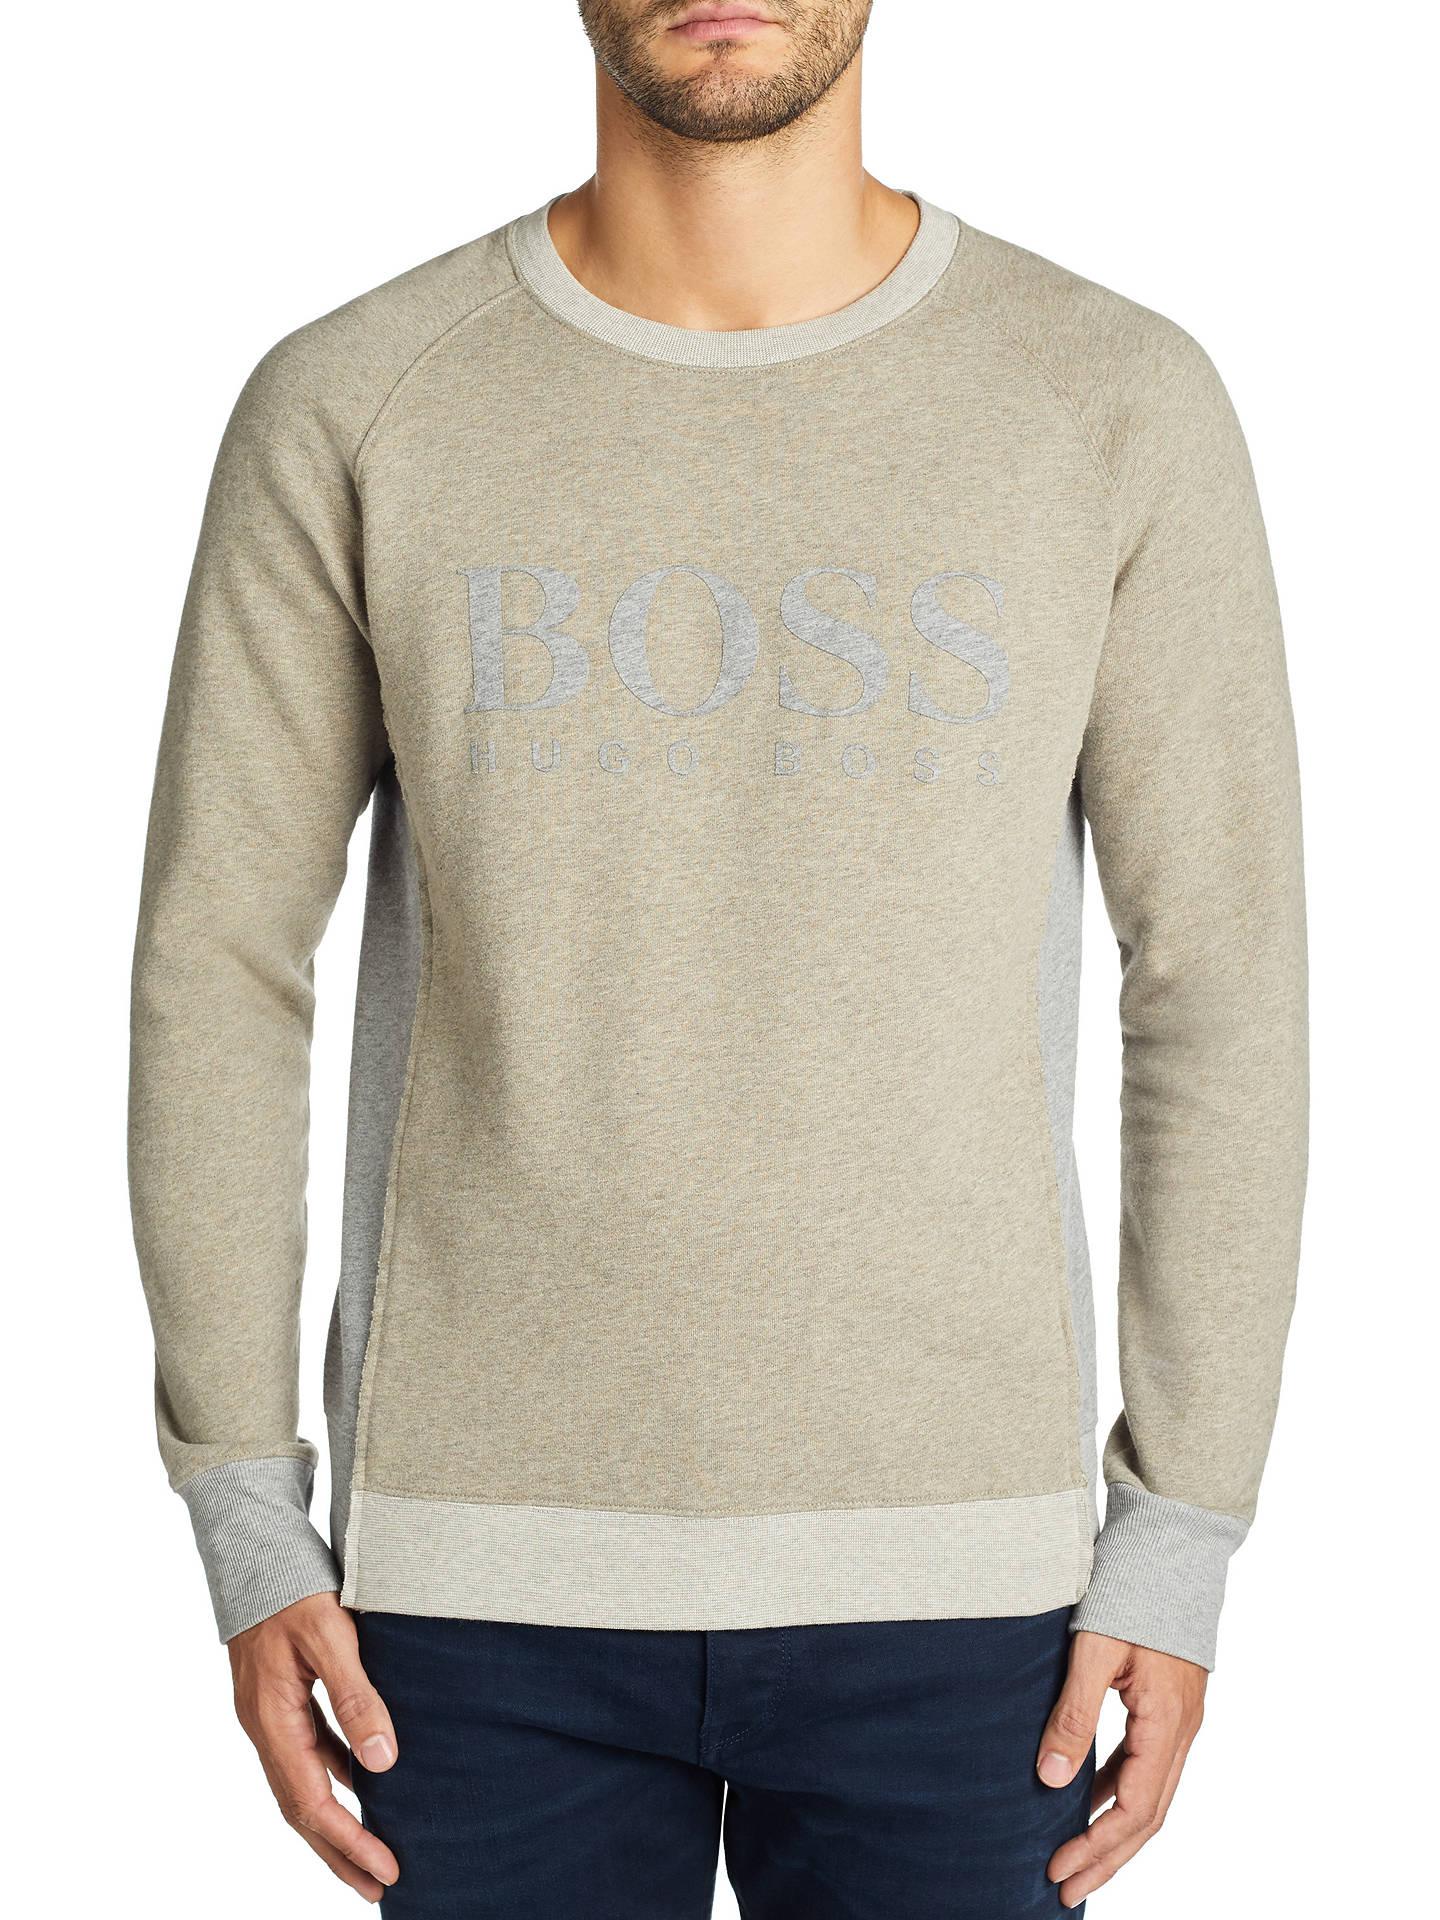 88873bb98a Buy BOSS Wenga Cotton Terry Logo Sweatshirt, Medium Beige, S Online at  johnlewis.